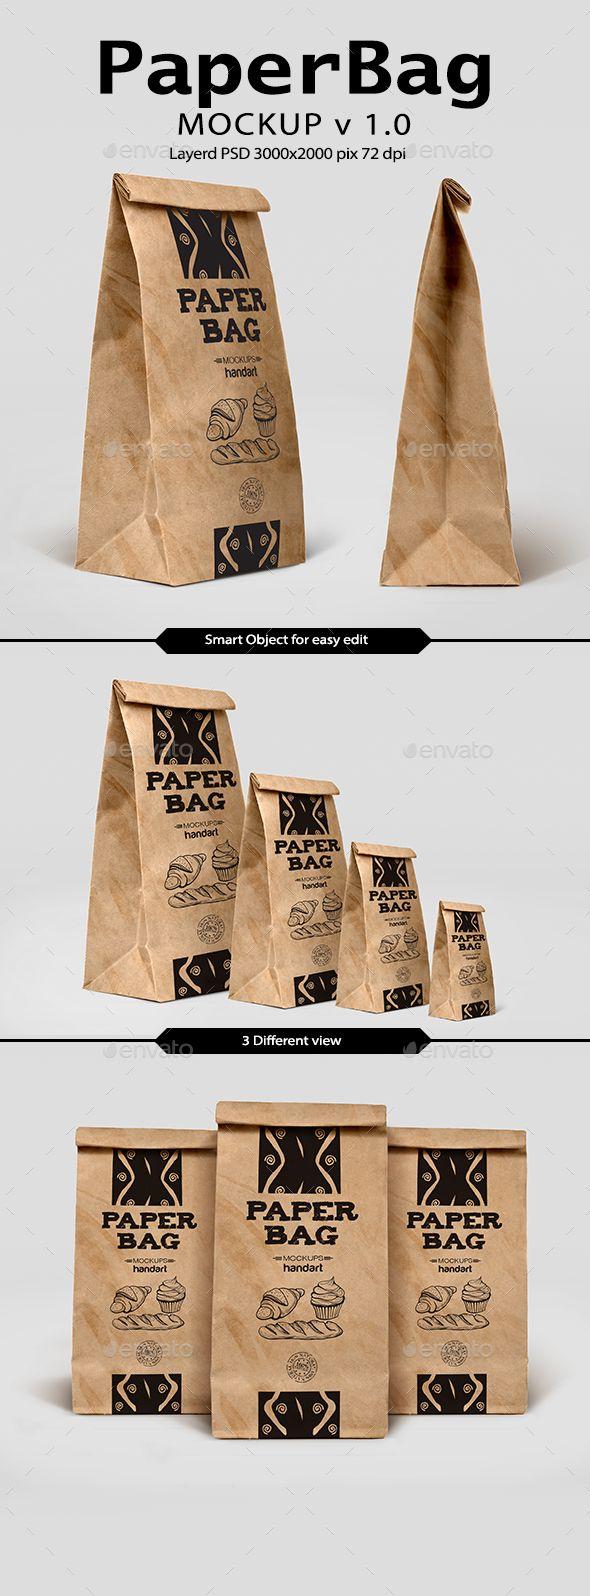 Download Paper Bag Mockup 1 0 Tea Packaging Design Bag Mockup Paper Bag